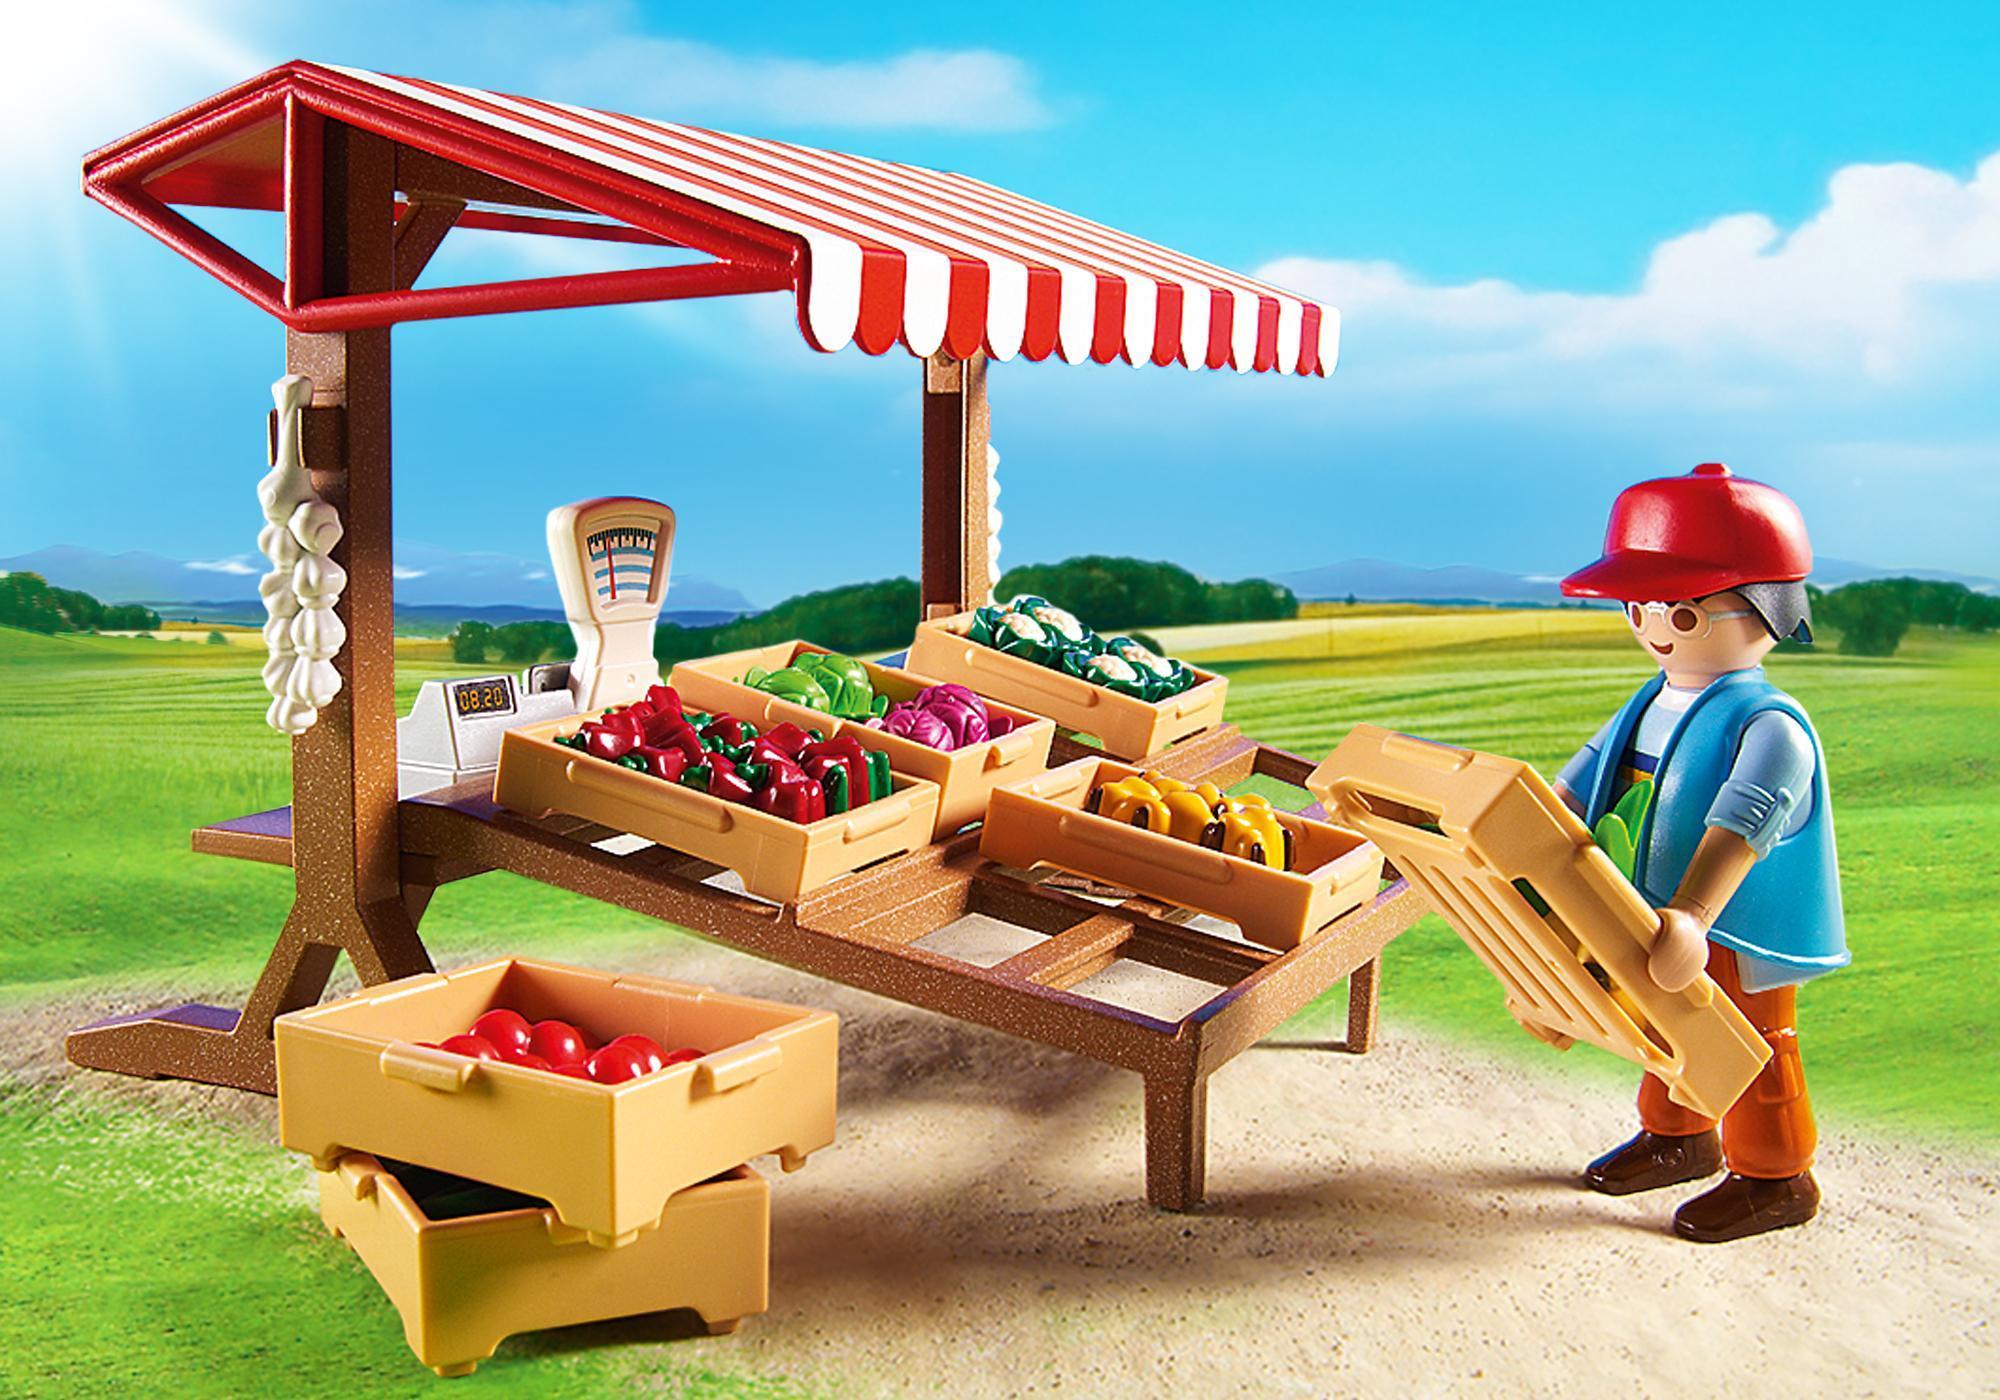 http://media.playmobil.com/i/playmobil/6121_product_extra2/Farmer's Market